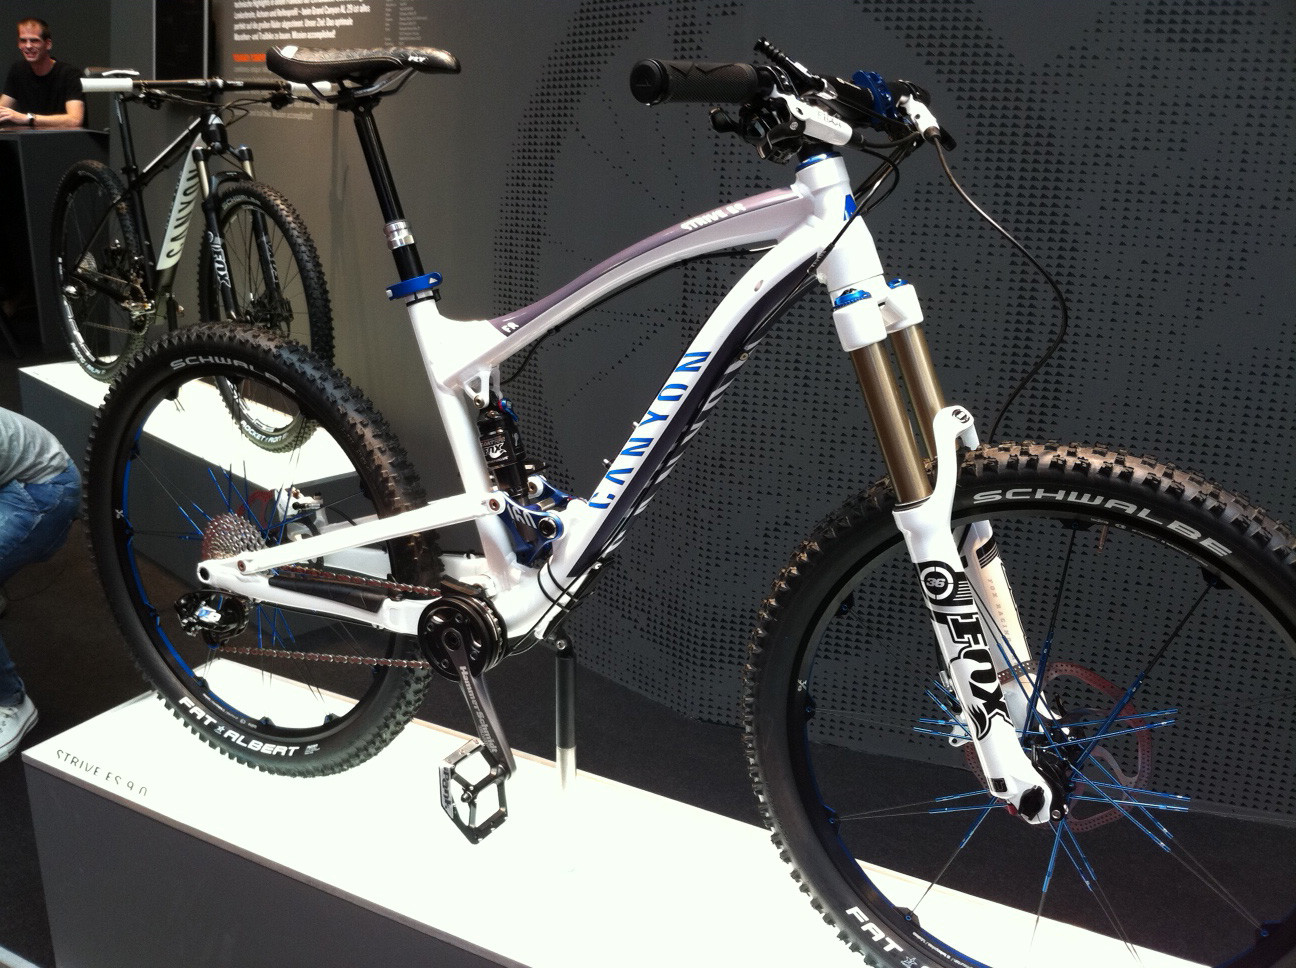 Canyon Cycles Strive ES 9.0 - Eurobike 2011 - Mountain Biking Pictures - Vital MTB